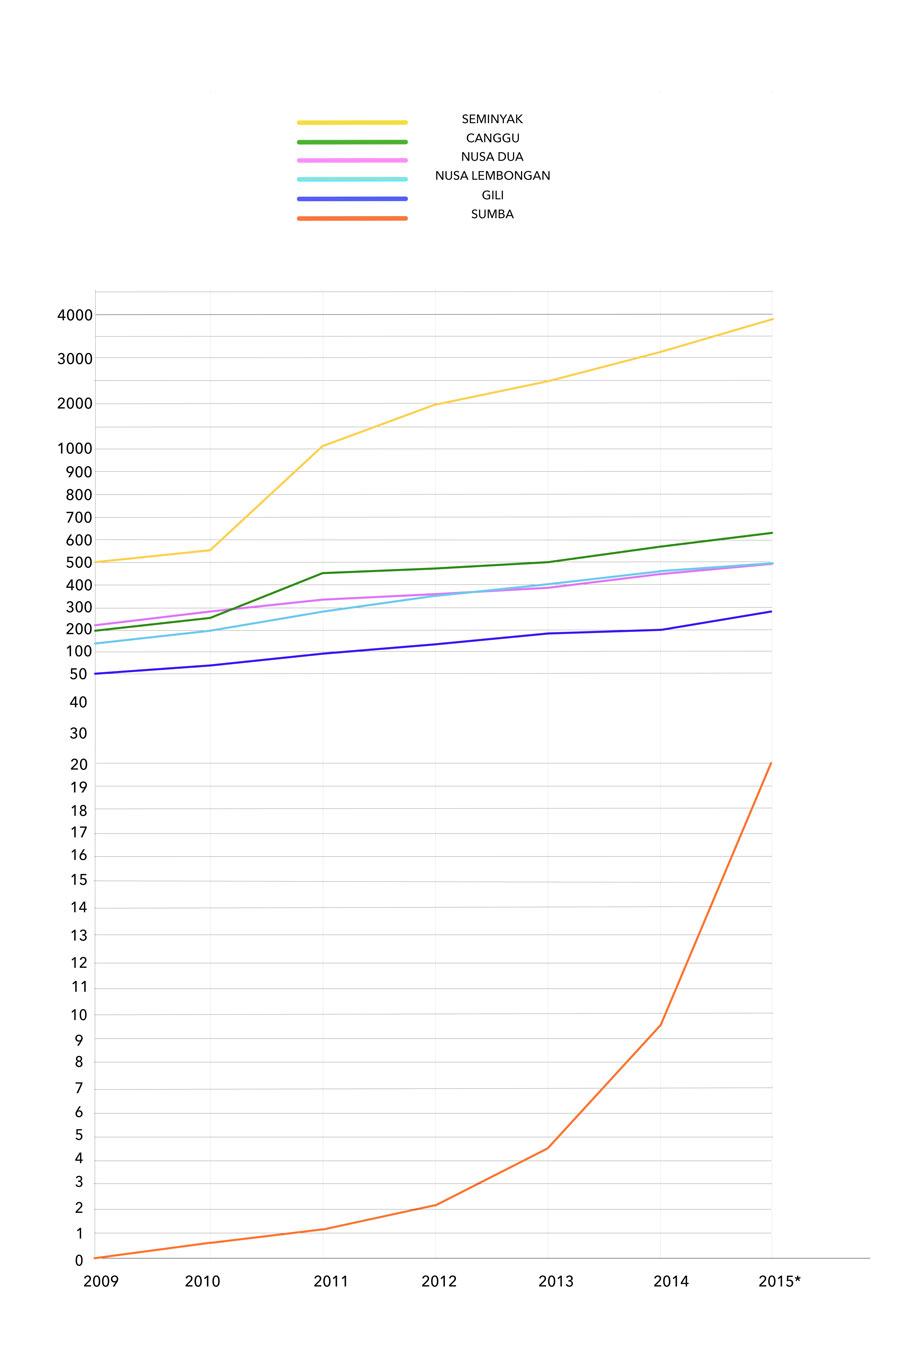 Sumba real estate price evolution